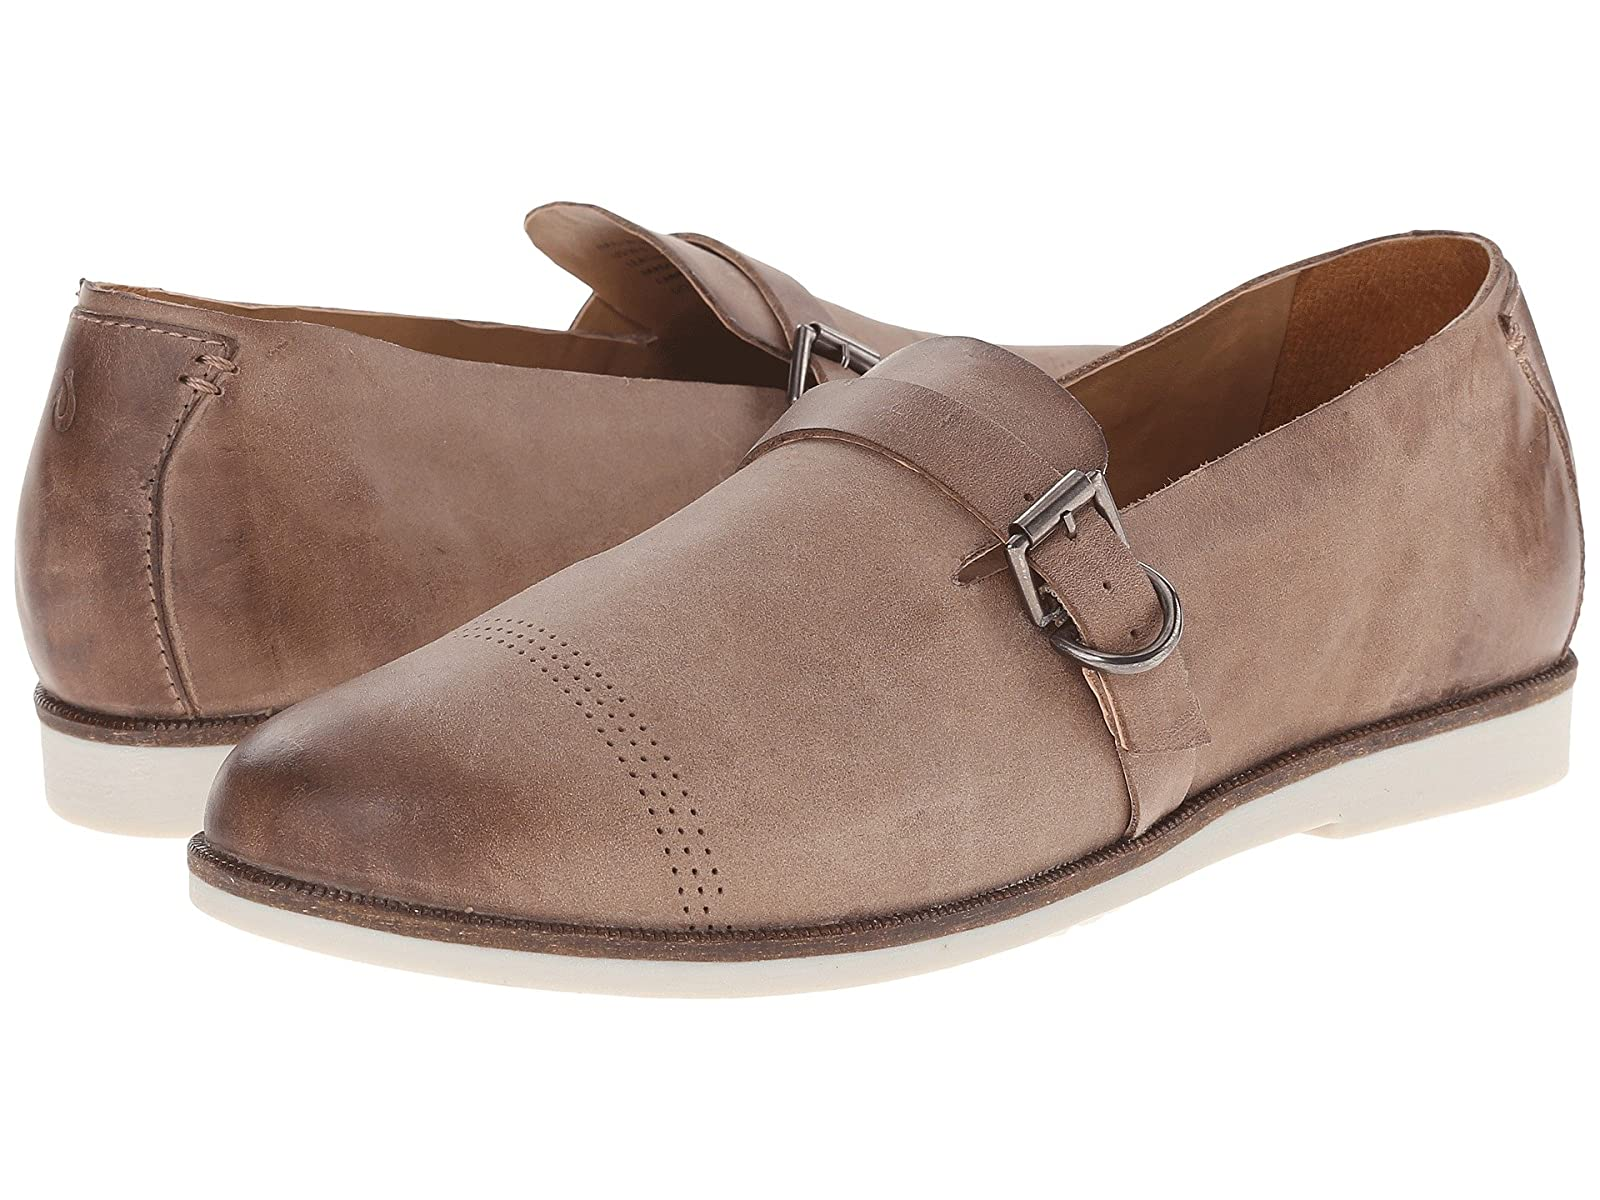 OluKai HailiCheap and distinctive eye-catching shoes